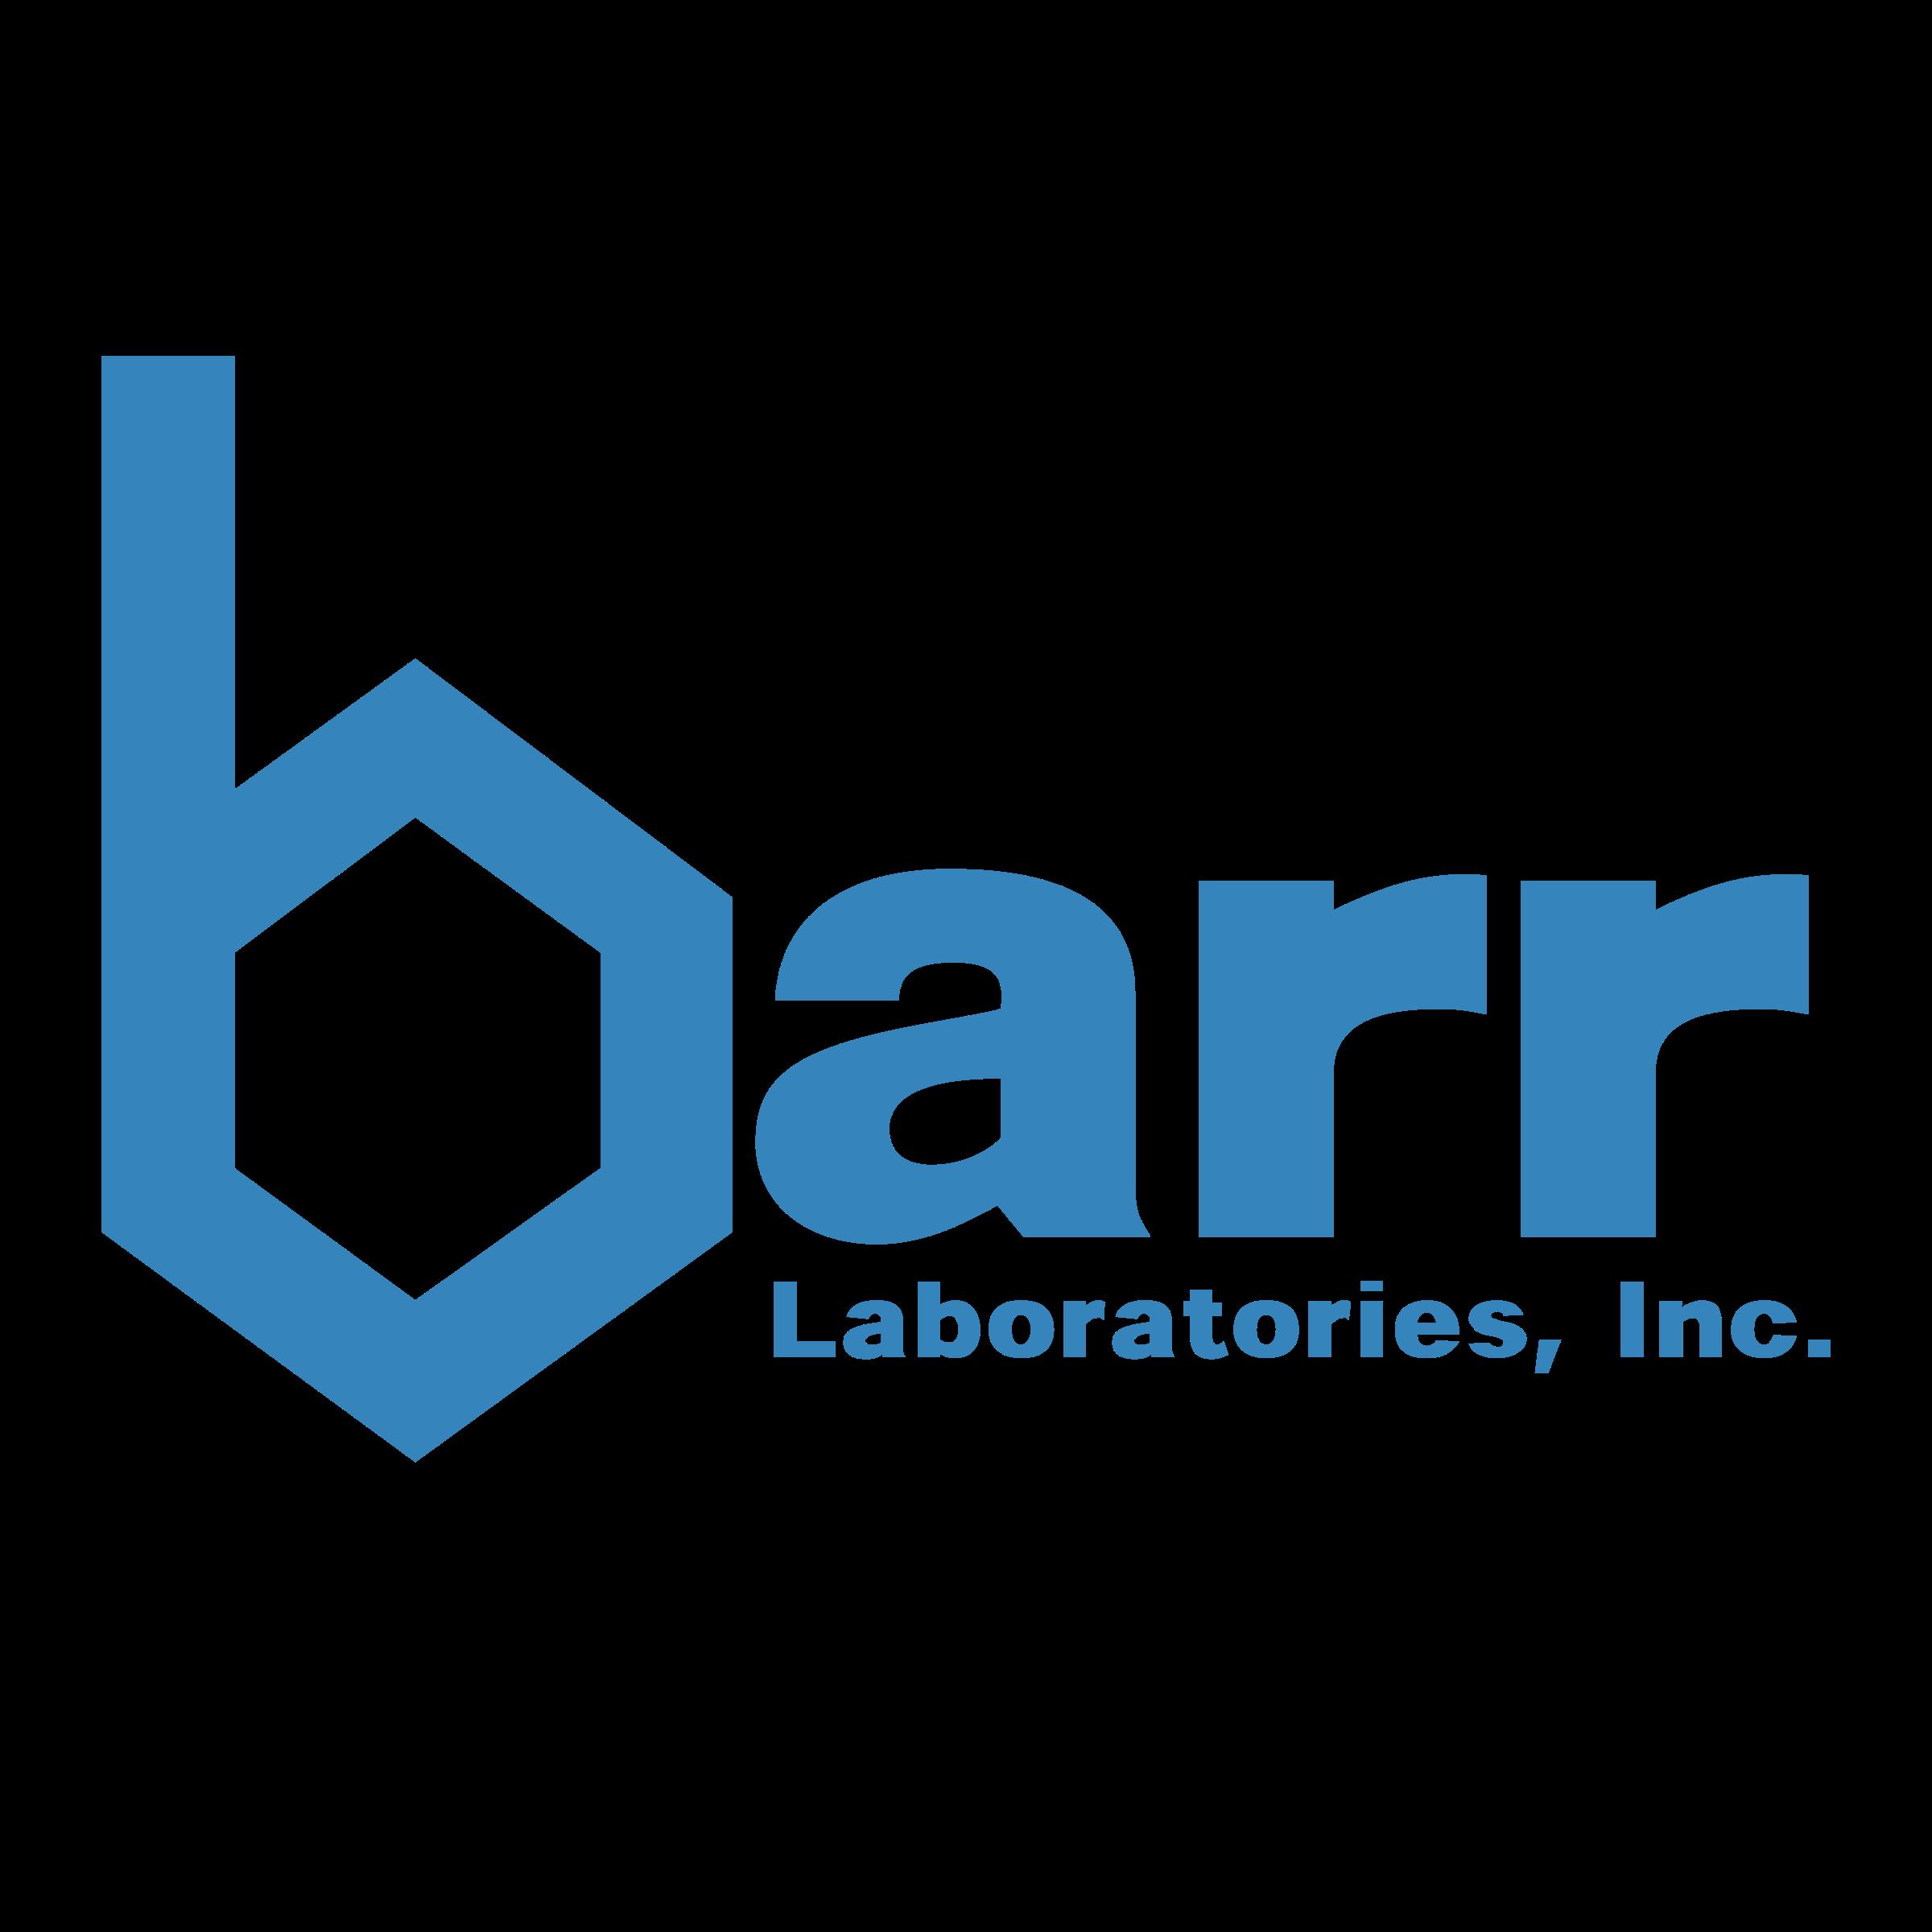 barr laboratories